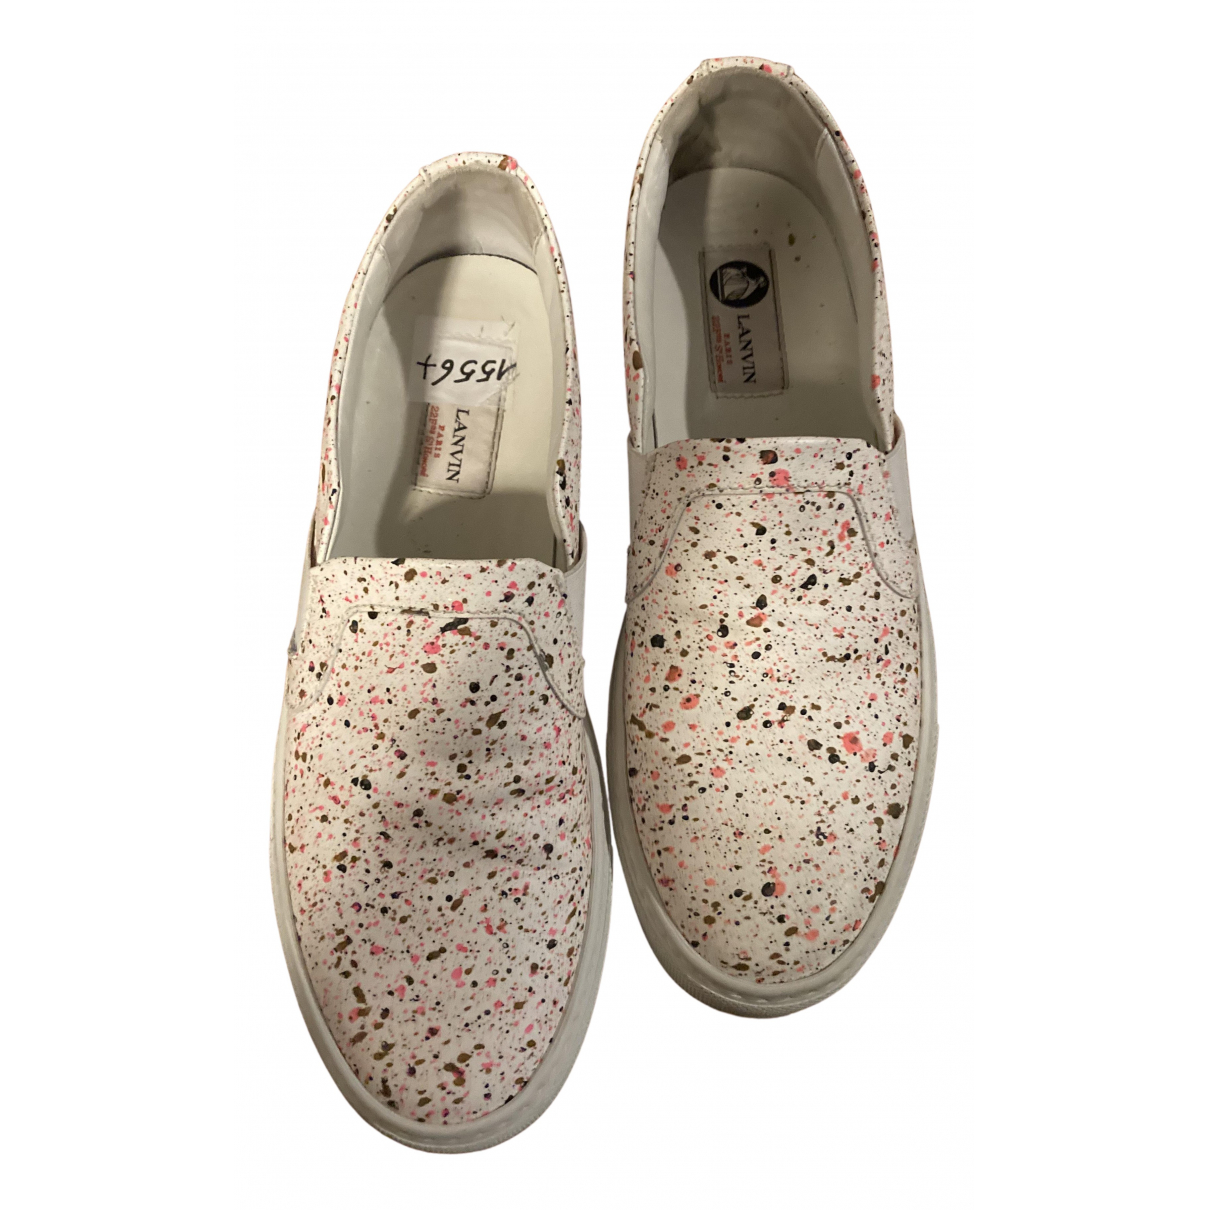 Lanvin \N Sneakers in  Bunt Leinen